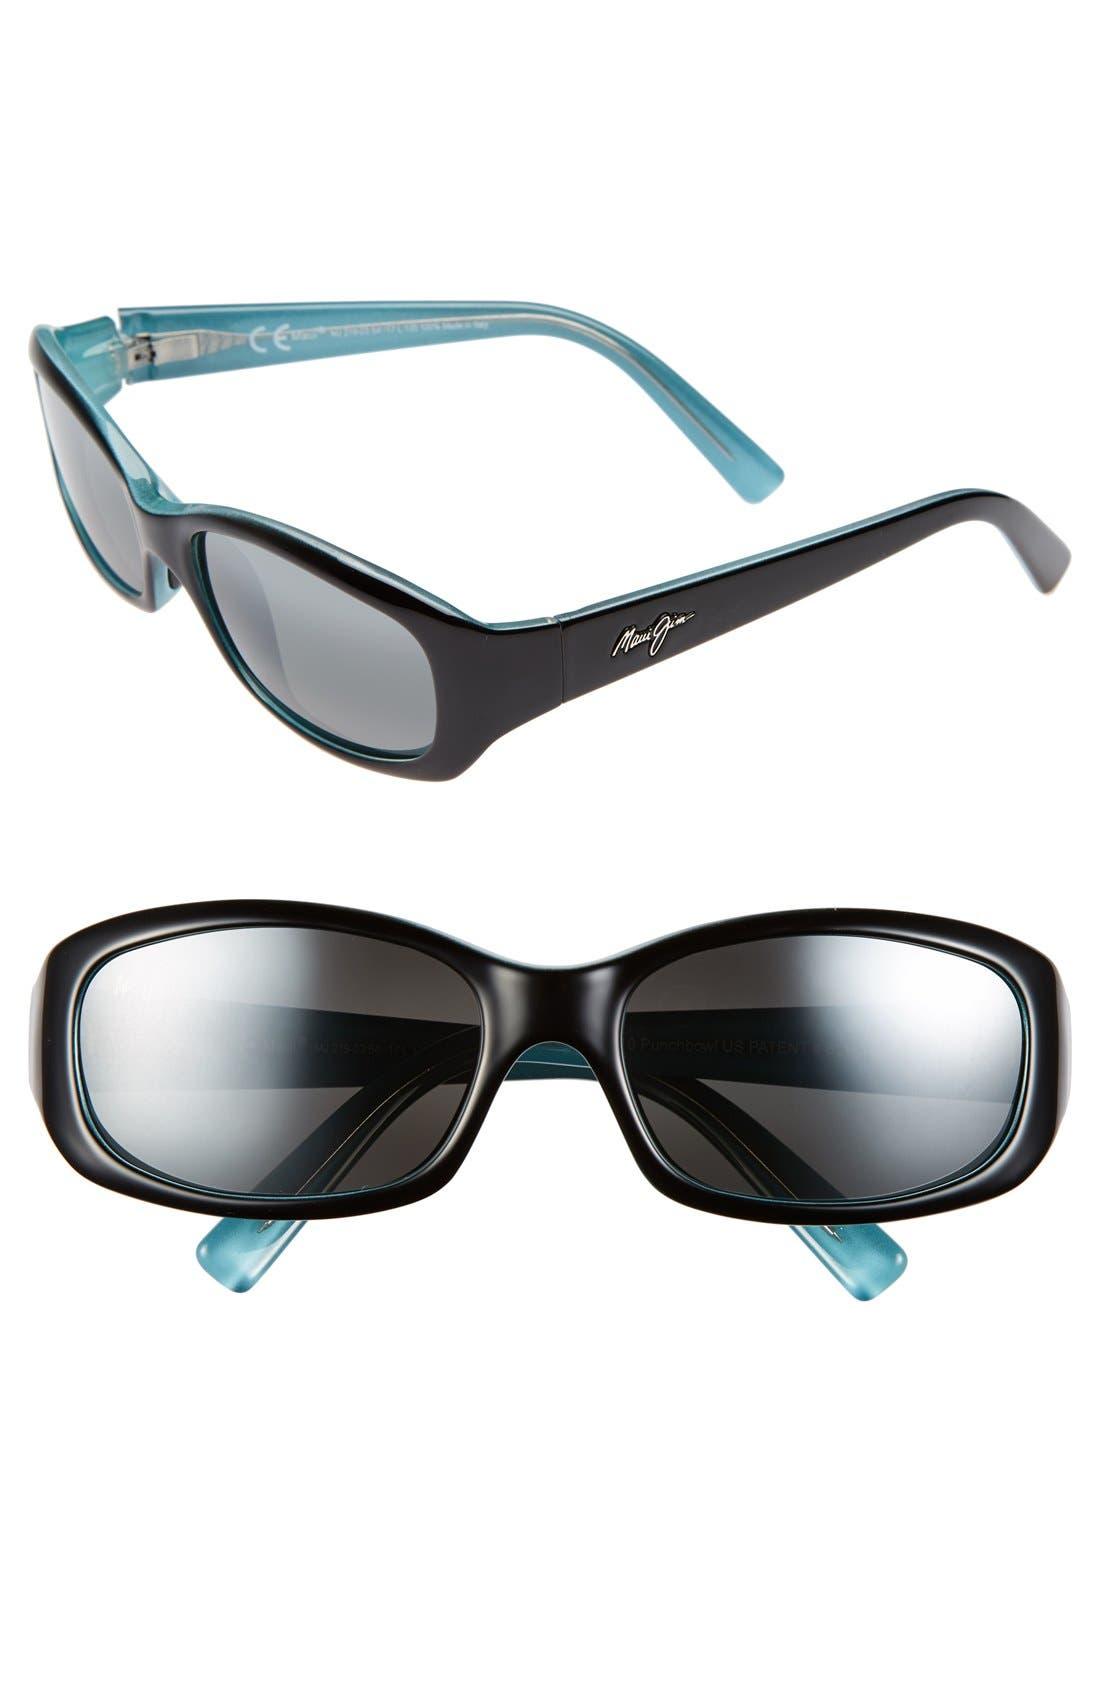 Maui Jim Punchbowl 5m Polarizedplus2 Rectangular Sunglasses -